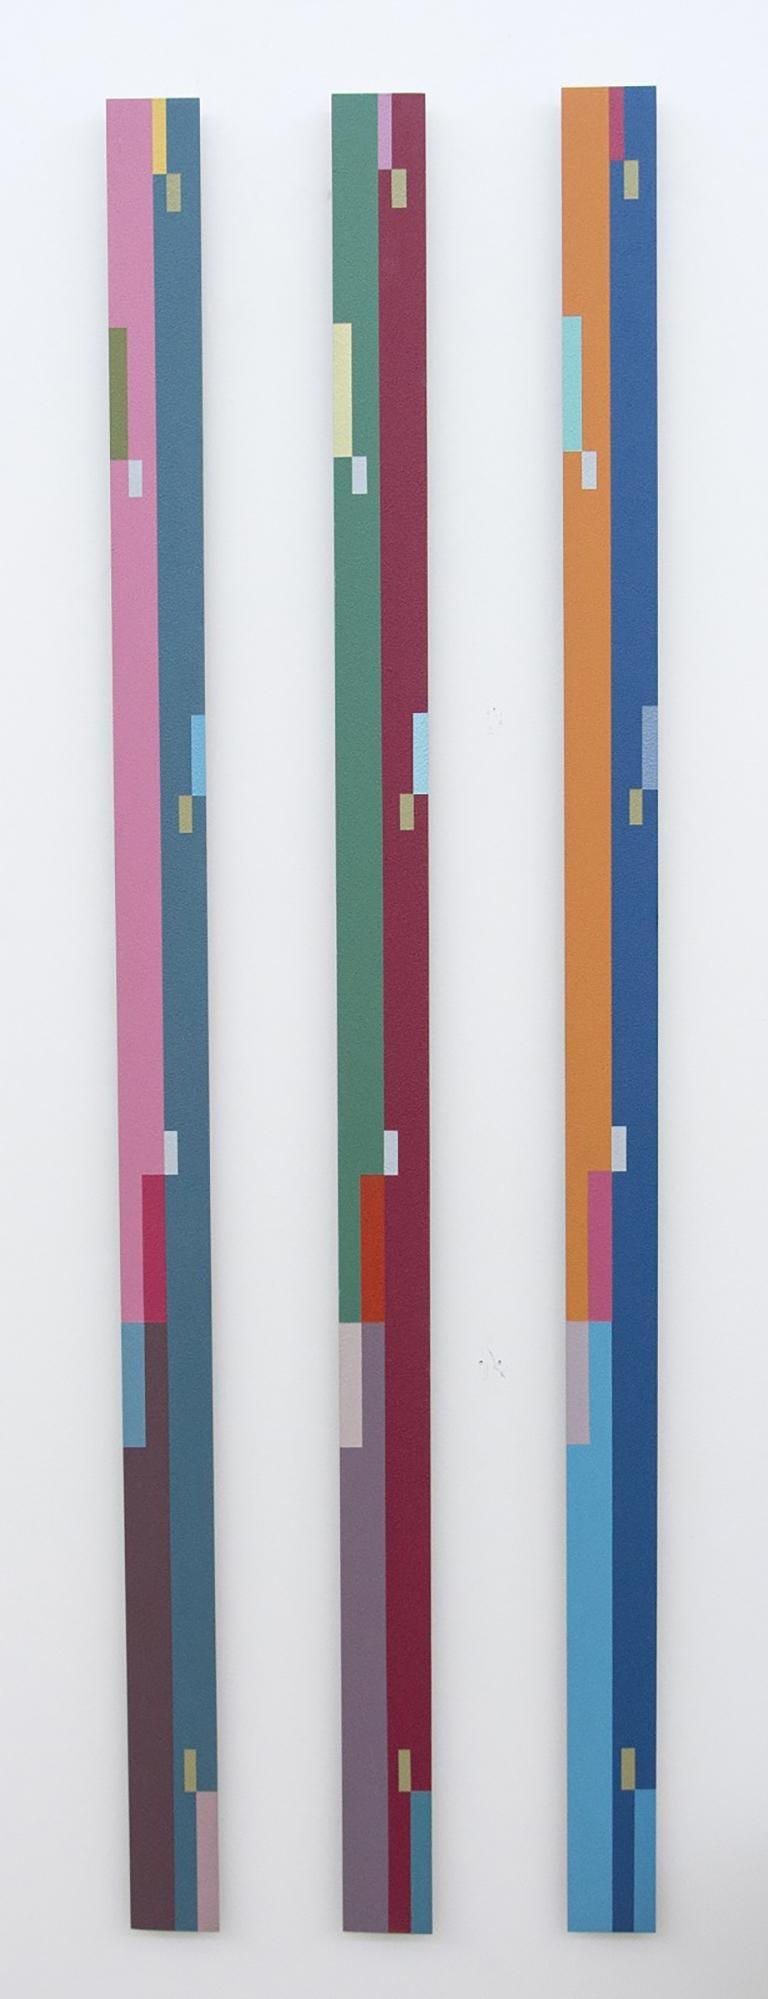 TTH Trio (1A 1B 1C) - tall, narrow, playful abstract shapes, acrylic on aluminum